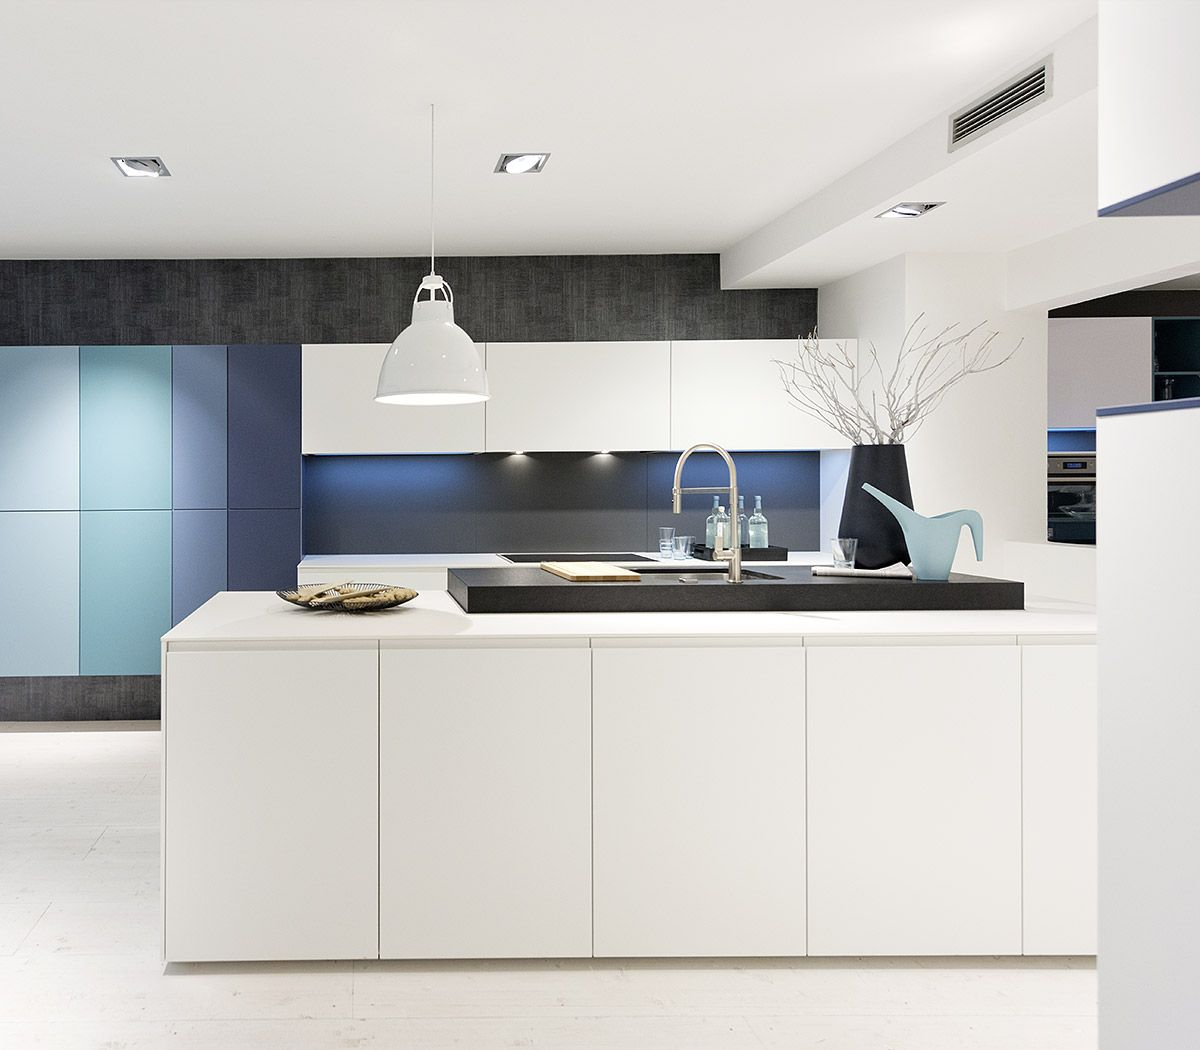 Küchenideen farben cuisines nolte  cuisinistes cuisines design cuisines antony